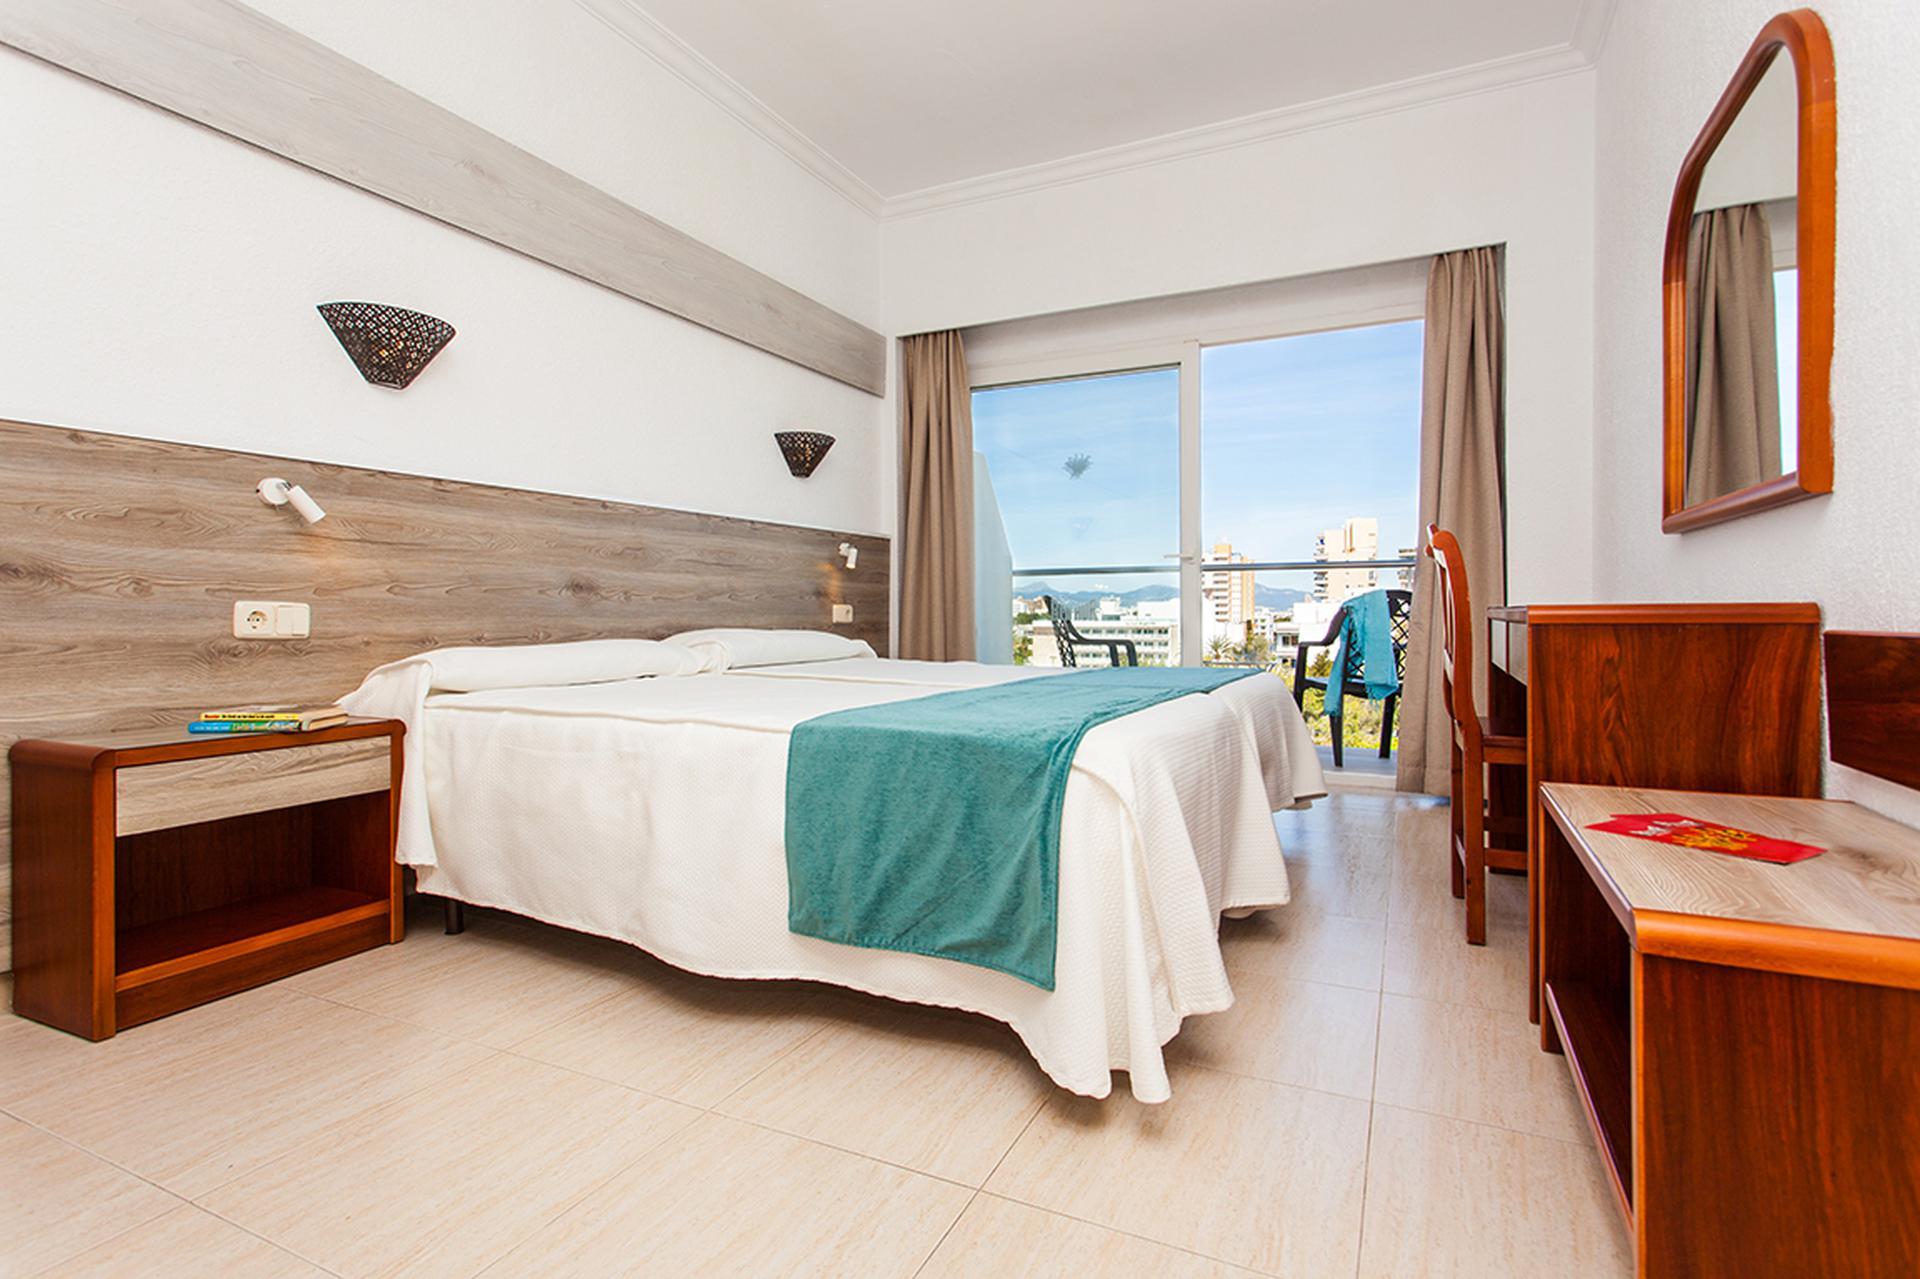 apartments ben hur mallorca spanien sunweb. Black Bedroom Furniture Sets. Home Design Ideas